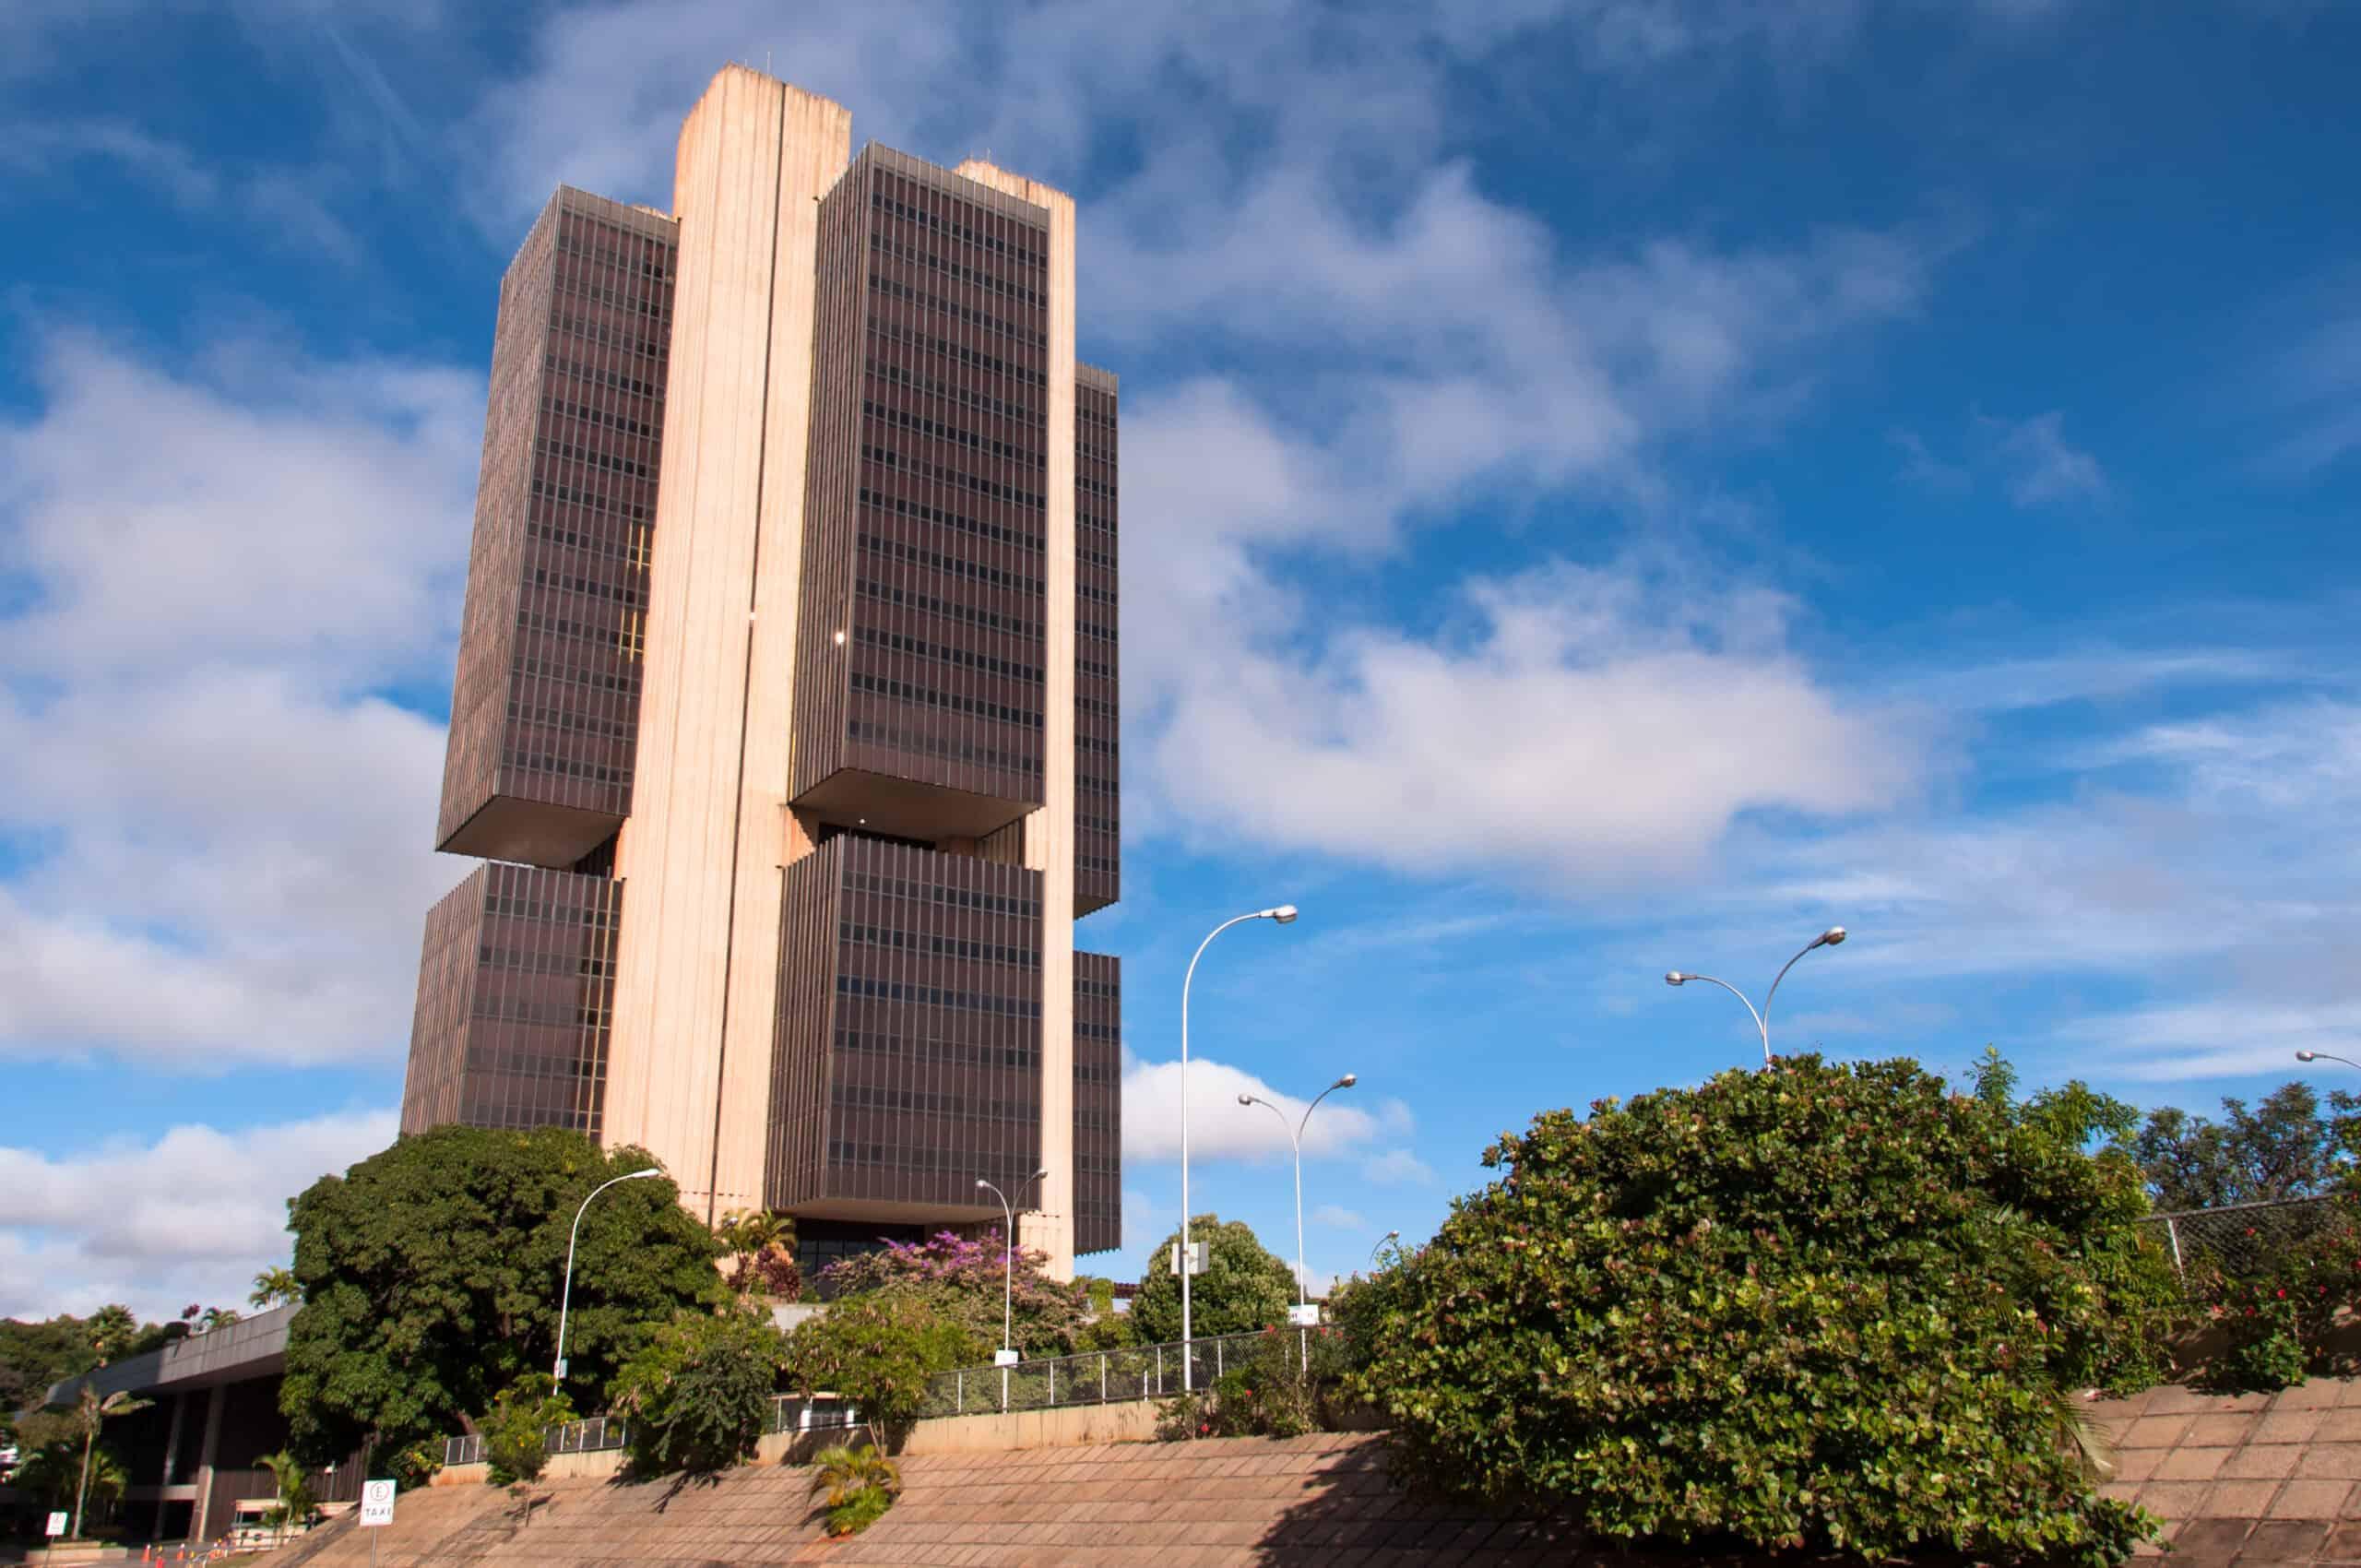 Banco Central anuncia medidas para incentivar crédito